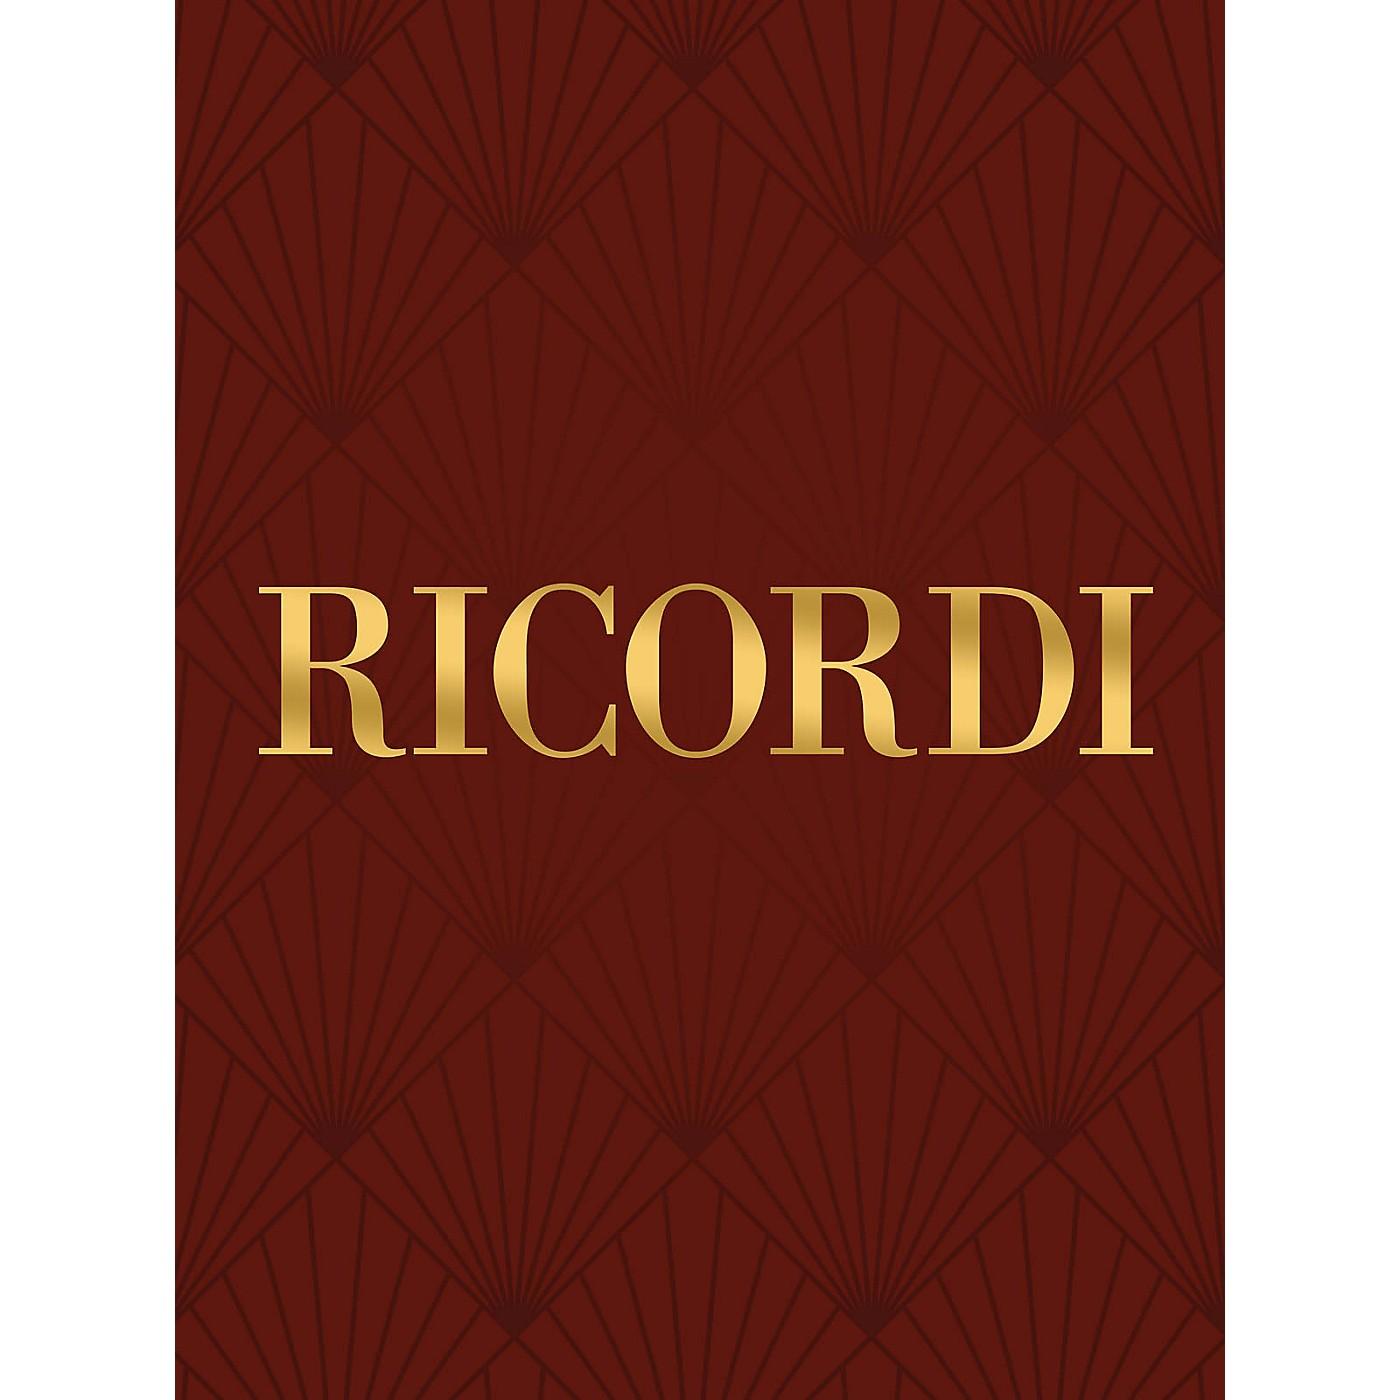 Ricordi Core 'ngrato (canzona napoletana) (High Voice) Vocal Solo Series Composed by S Cardillo thumbnail